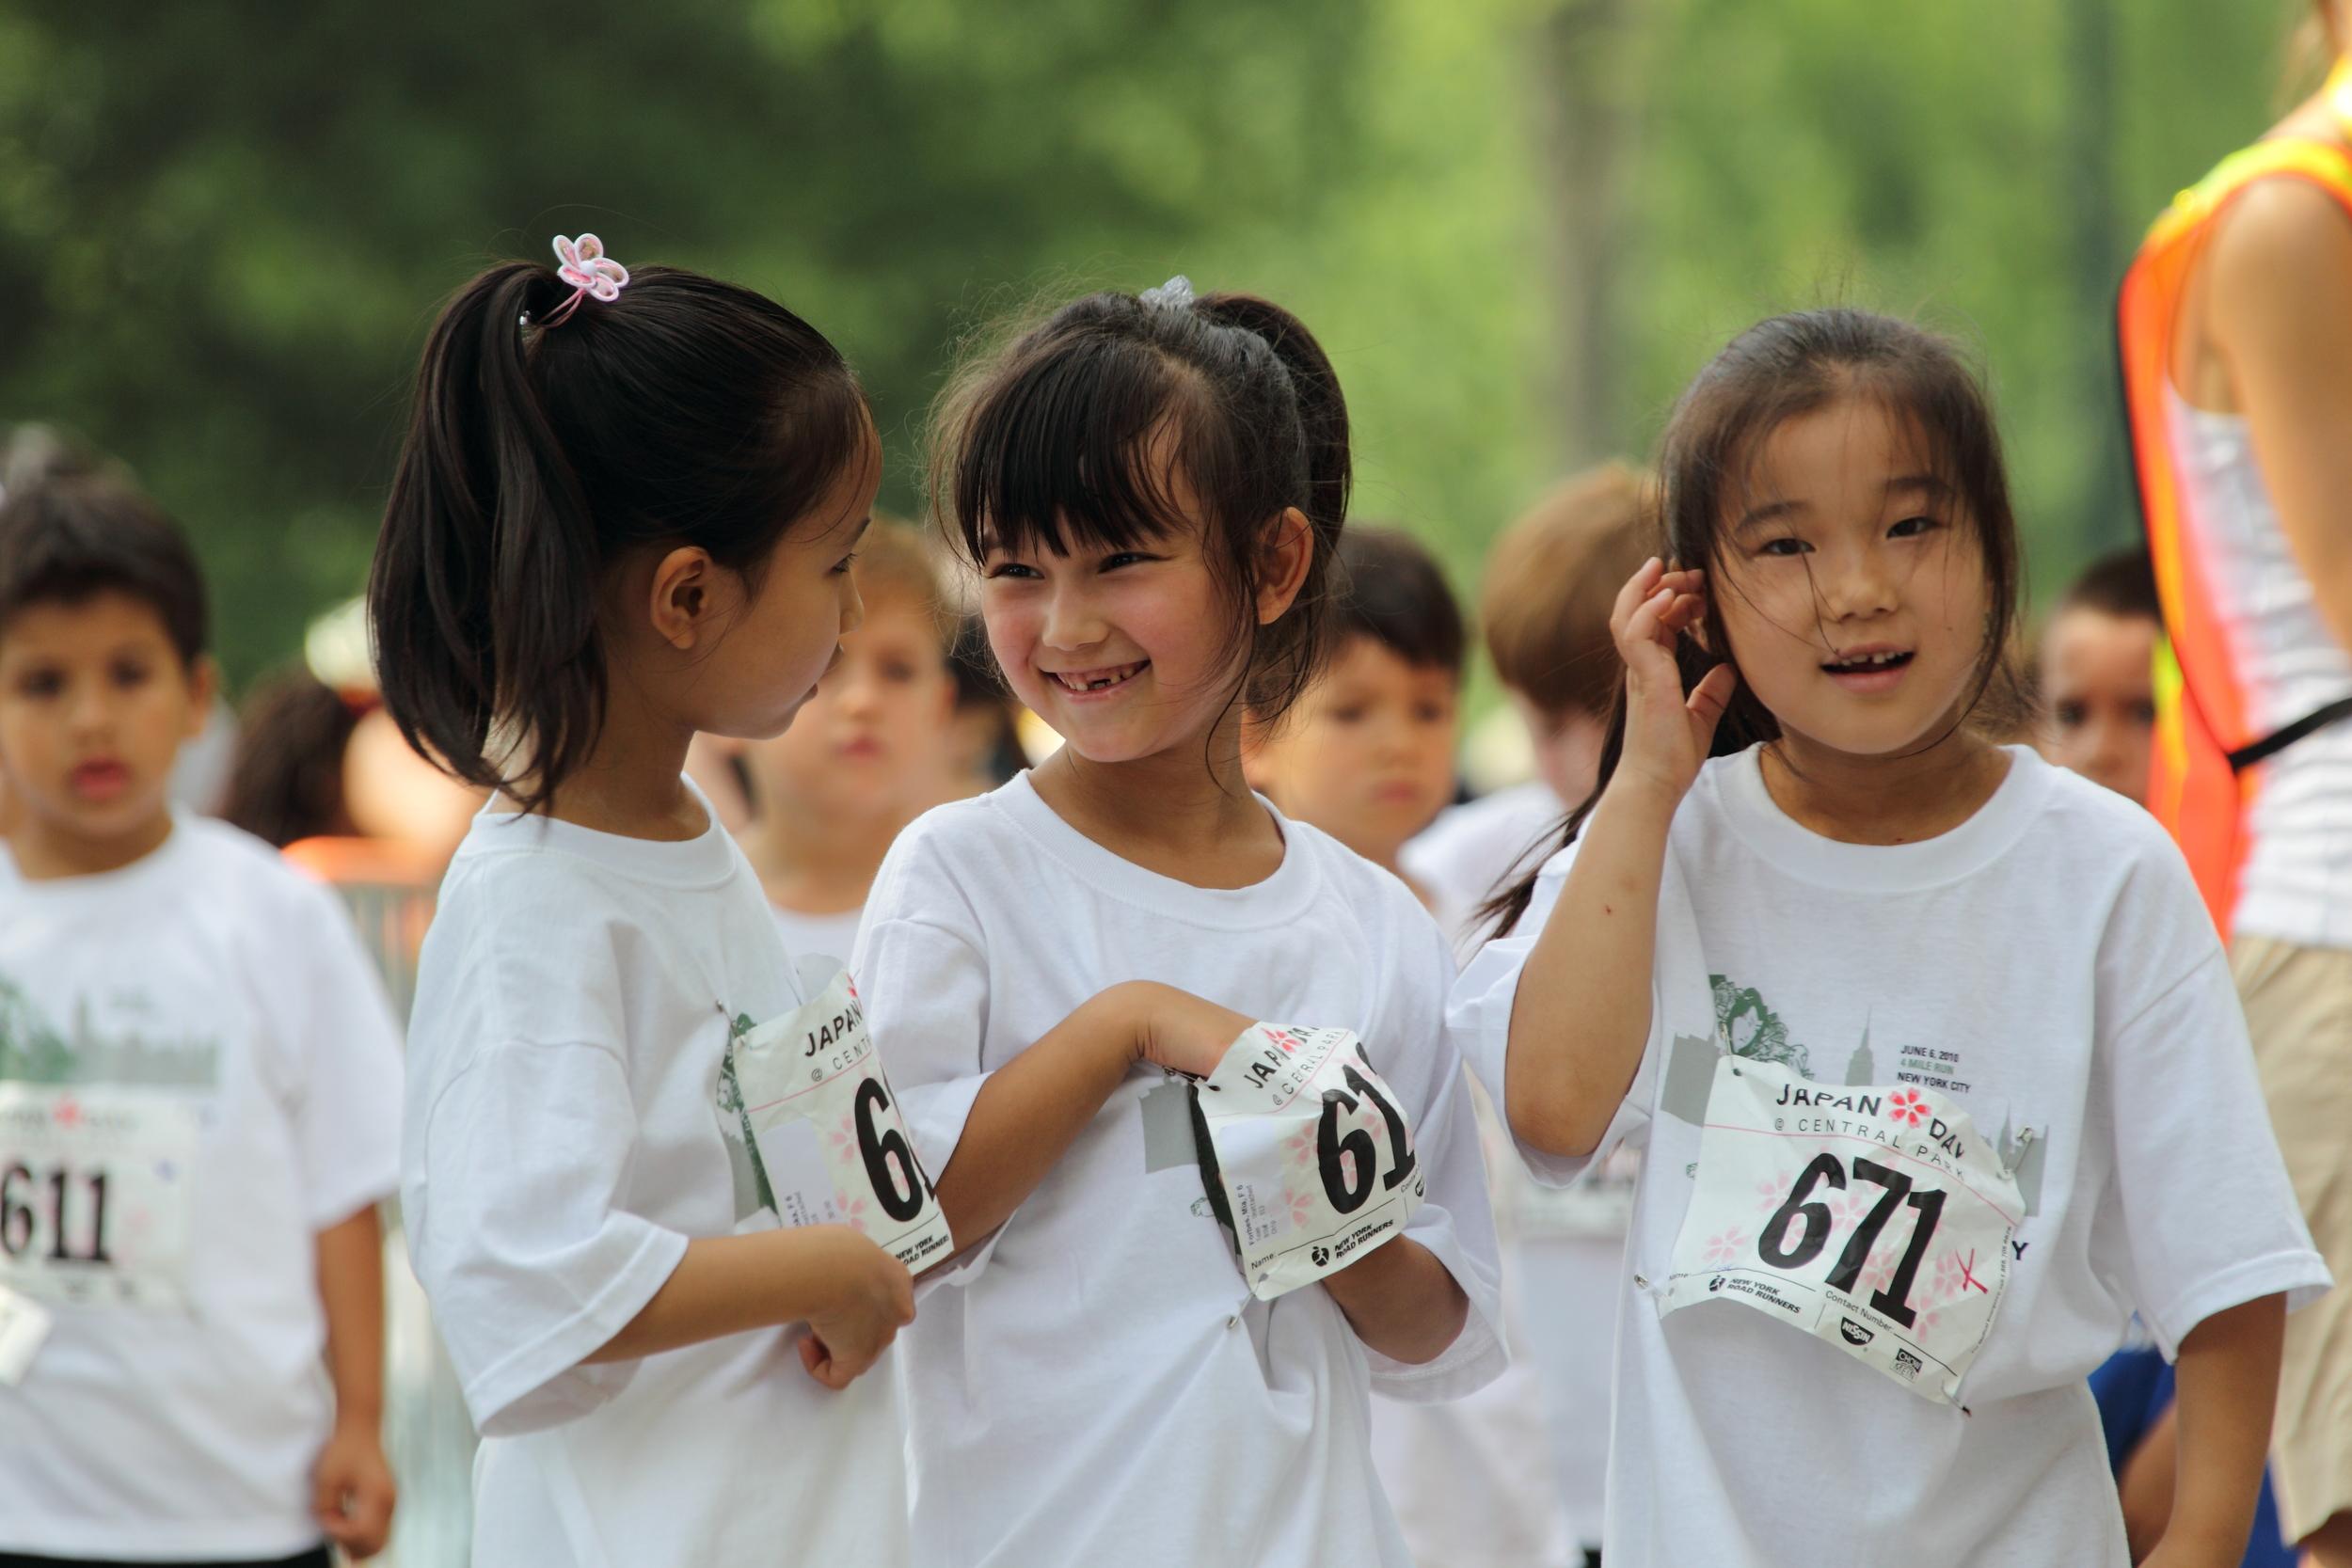 Japan Day 2010-0606-00105.JPG